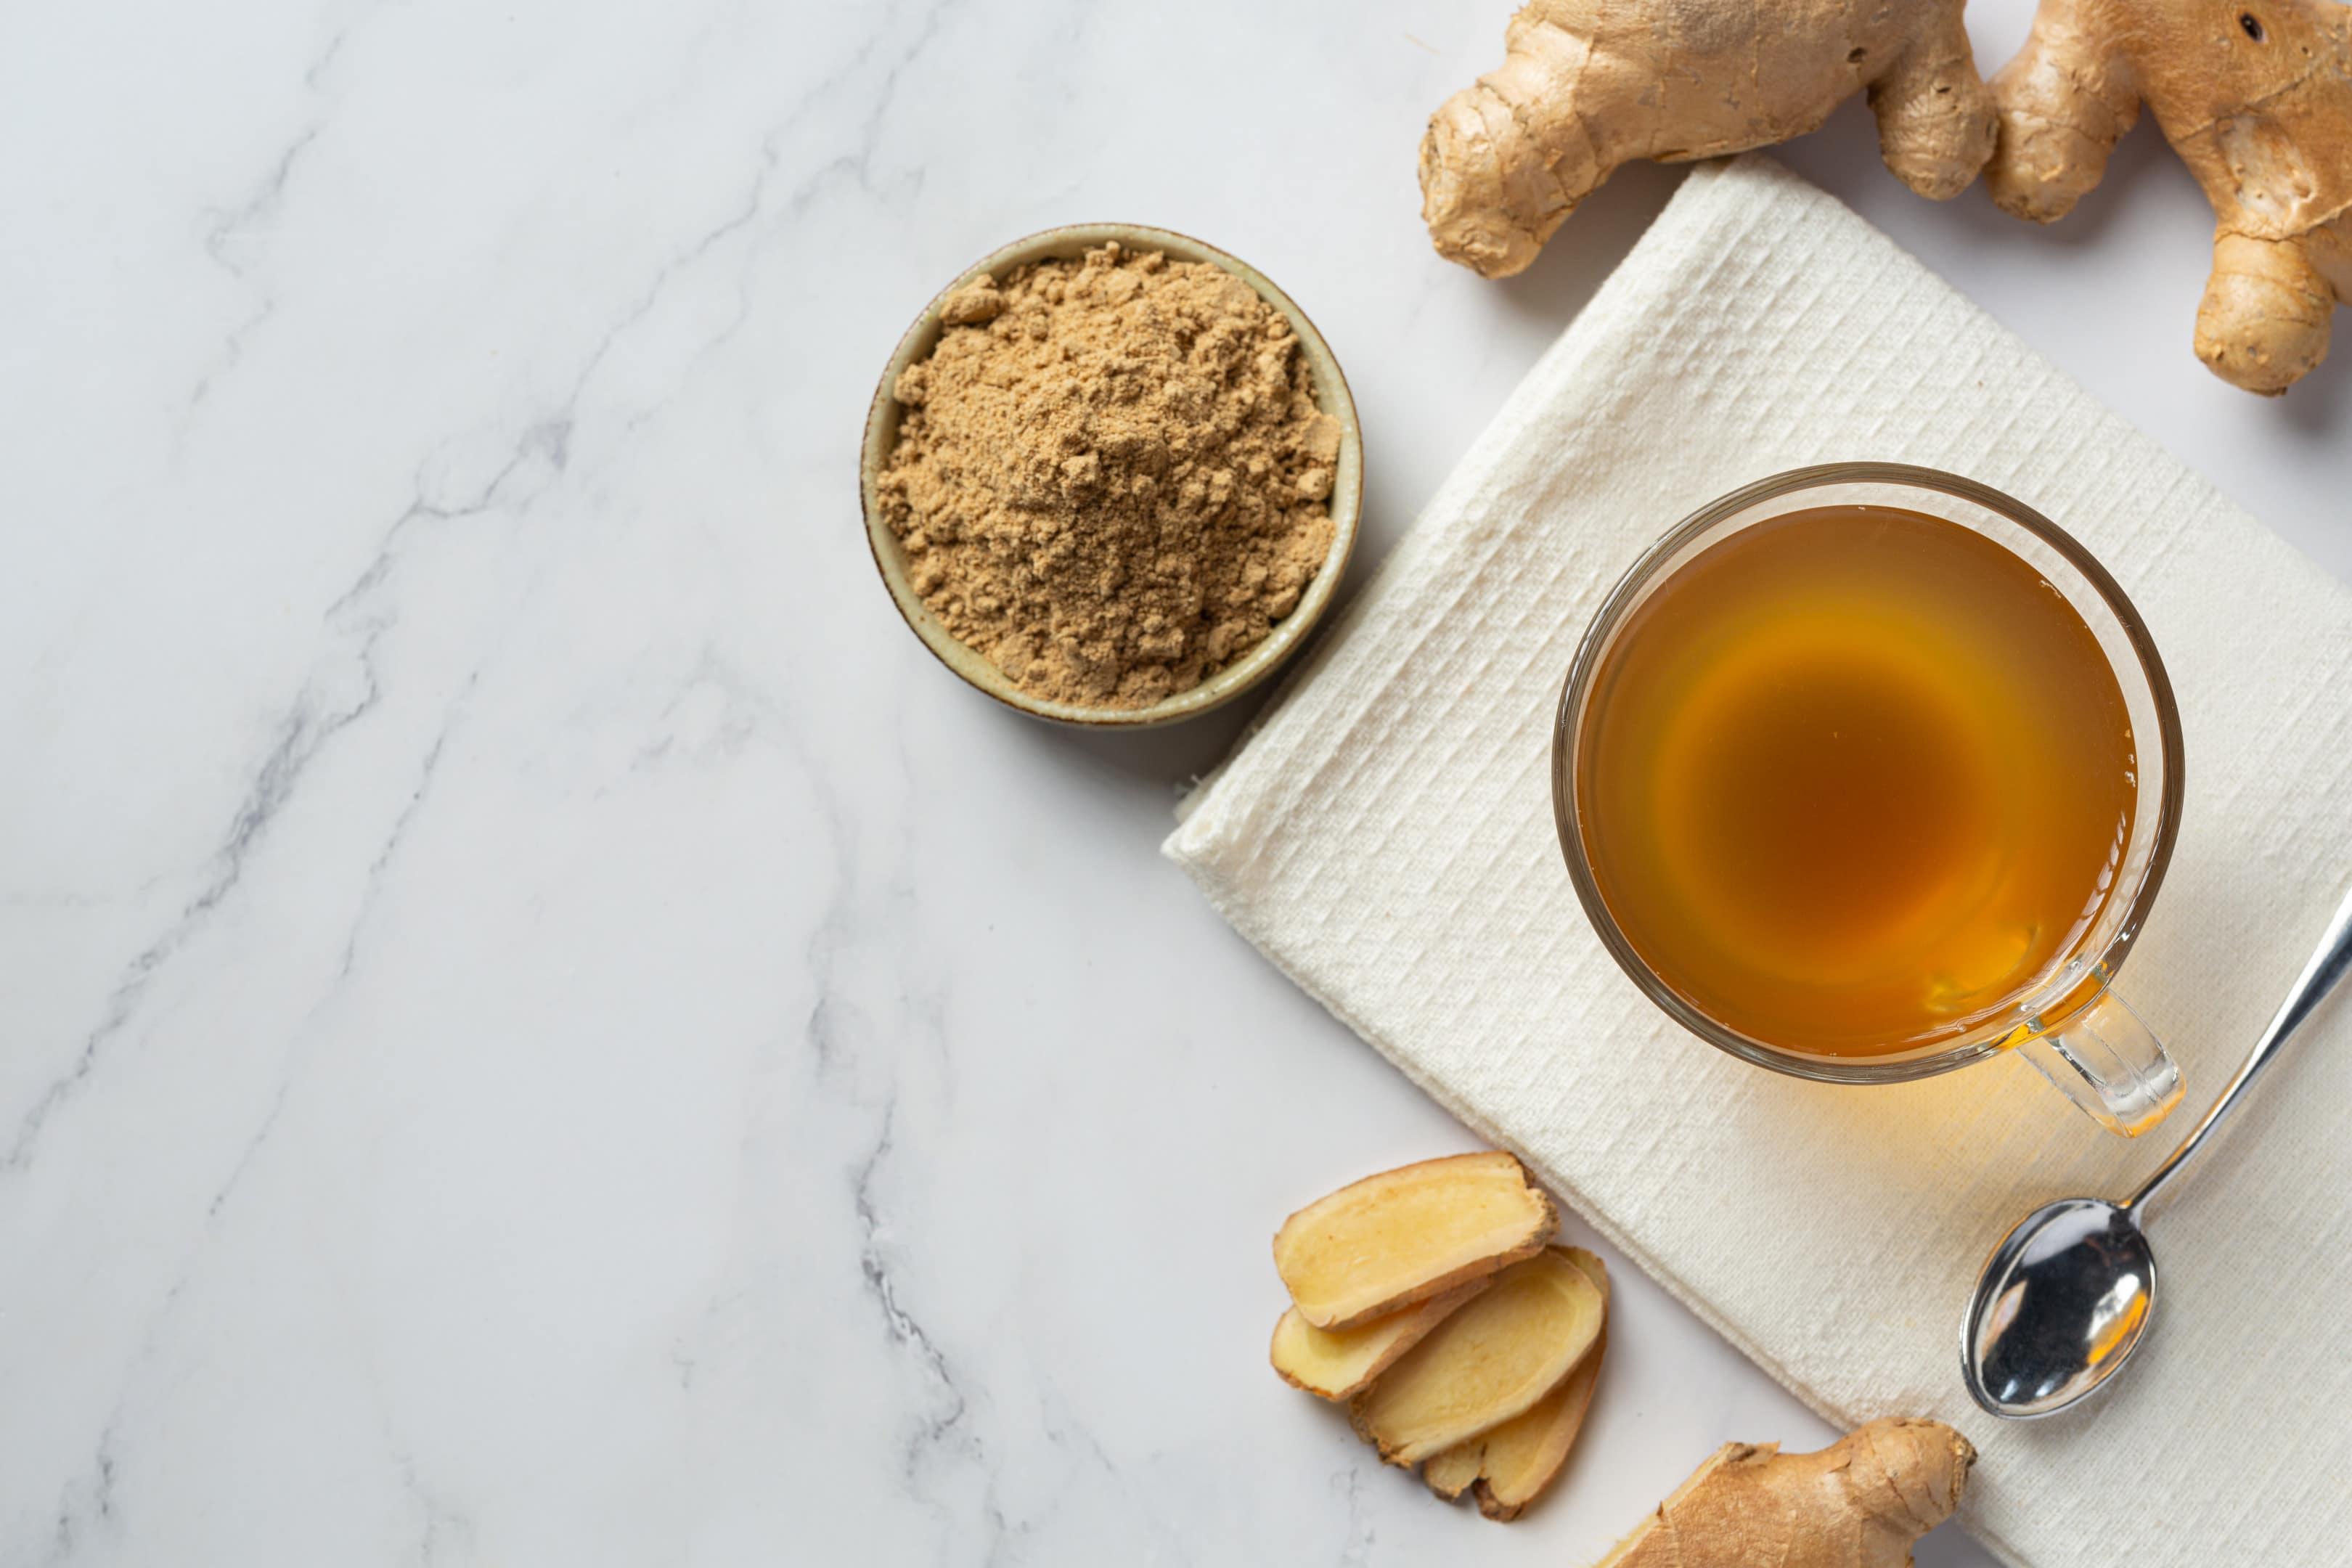 Hot ginger tea with fresh ginger